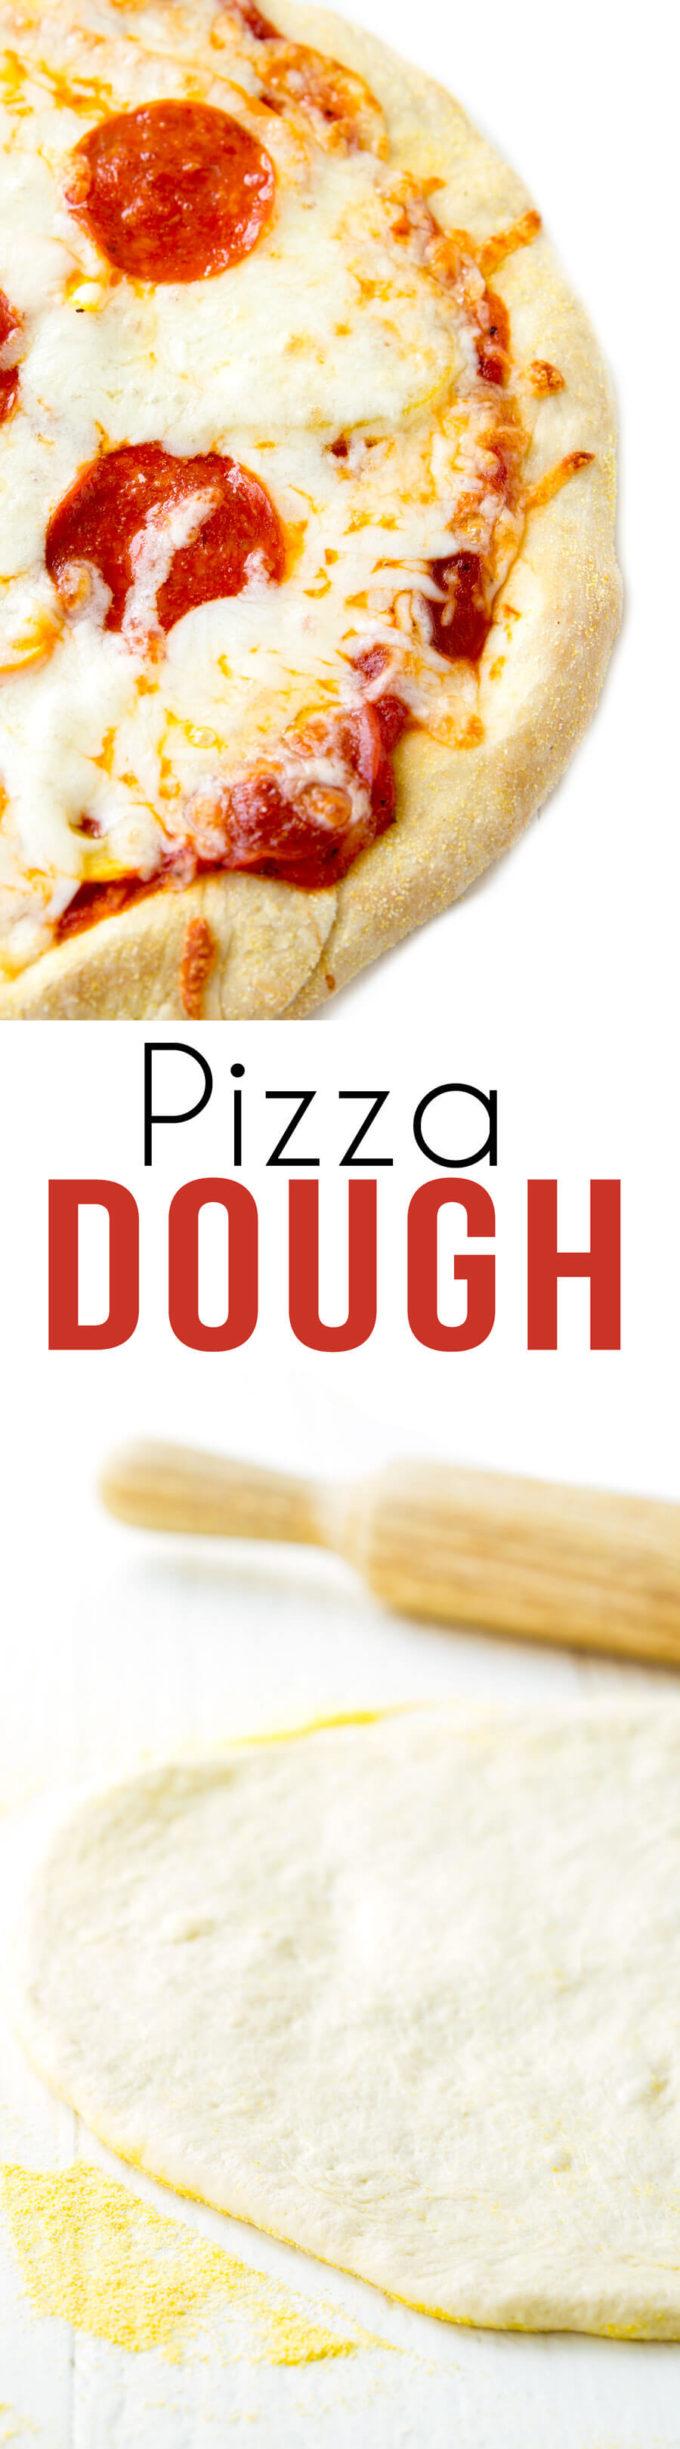 Pizza Dough - Easy Peasy Meals